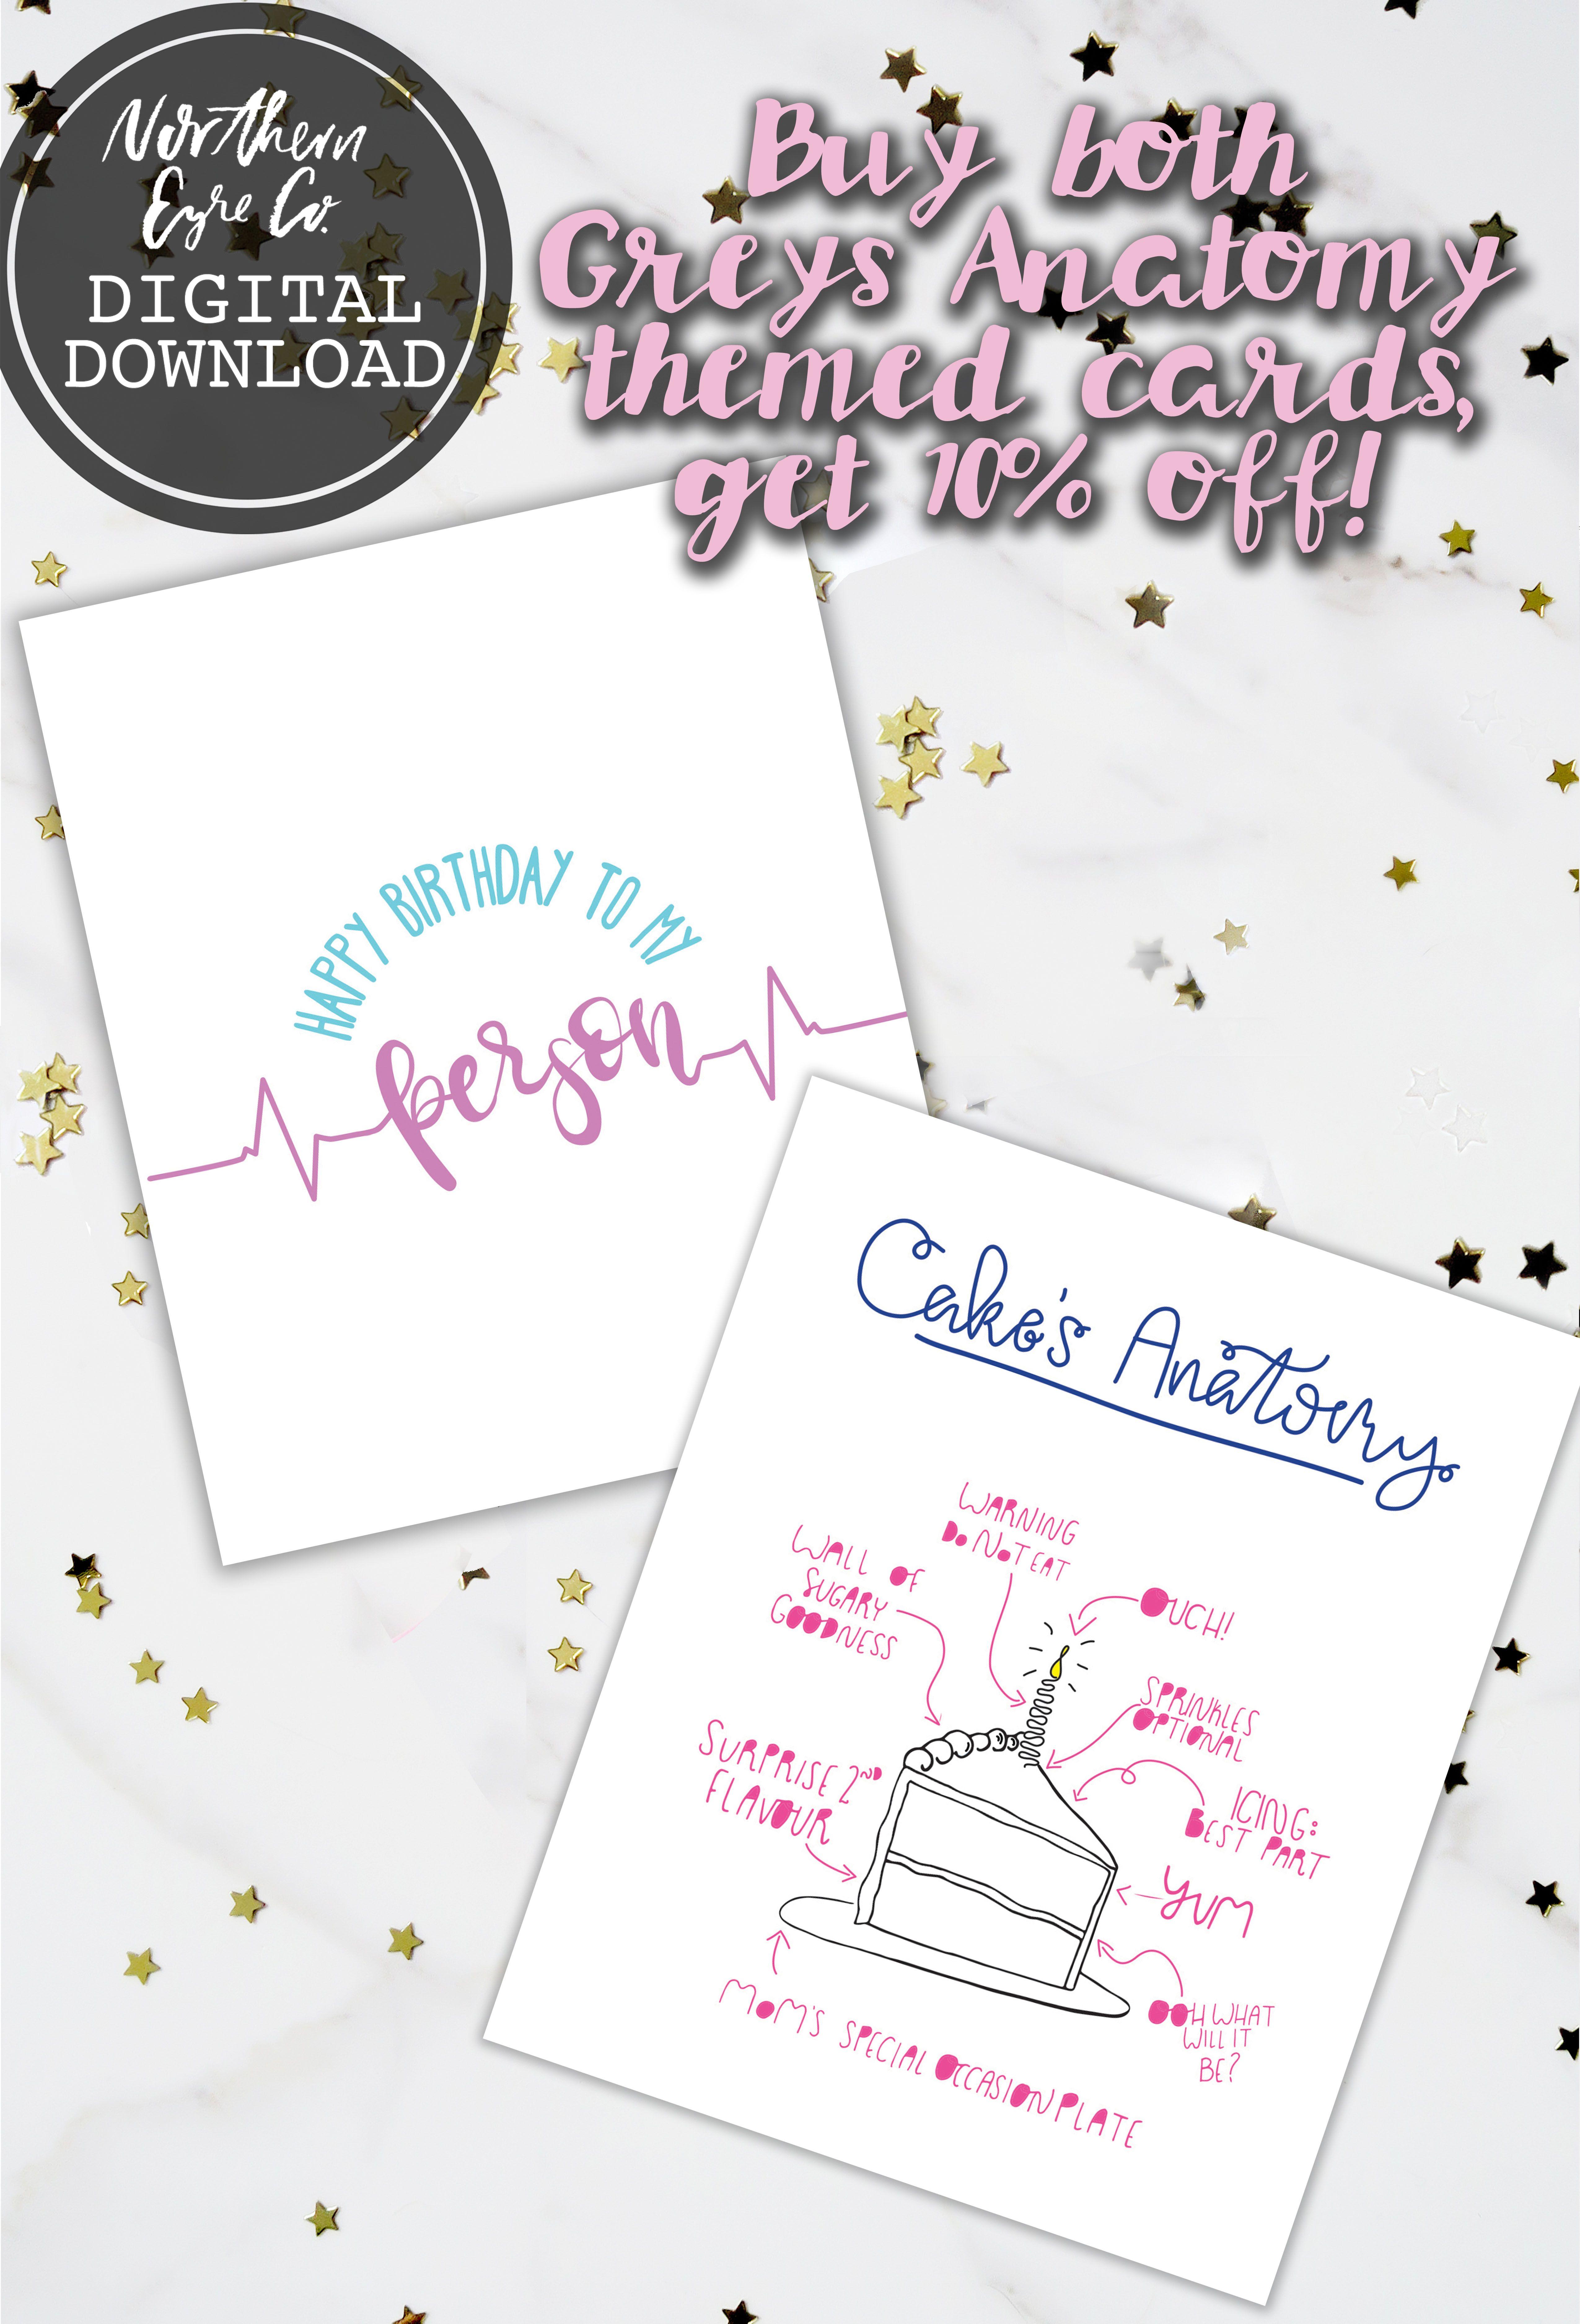 Printable Birthday Card Sale By Northern Eyre Co Etsy Shop Birthdaycards Cake Meredithgrey Greysanatomy Youremyperson